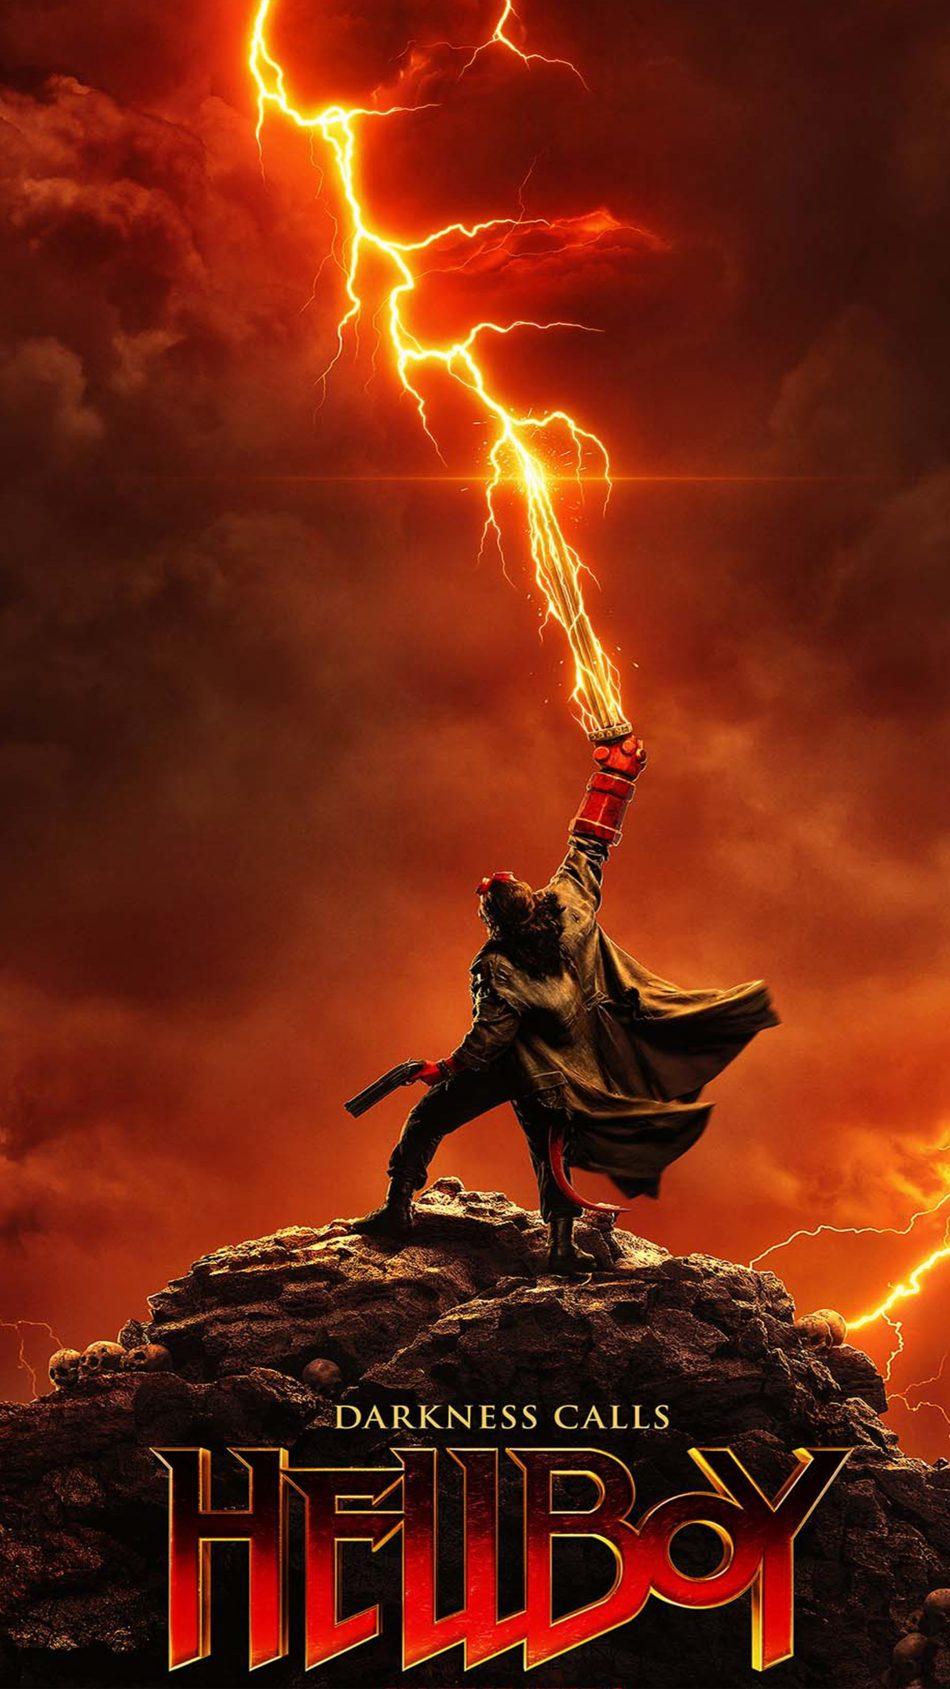 Darkness Calls Hellboy 2019 4K Ultra HD Mobile Wallpaper